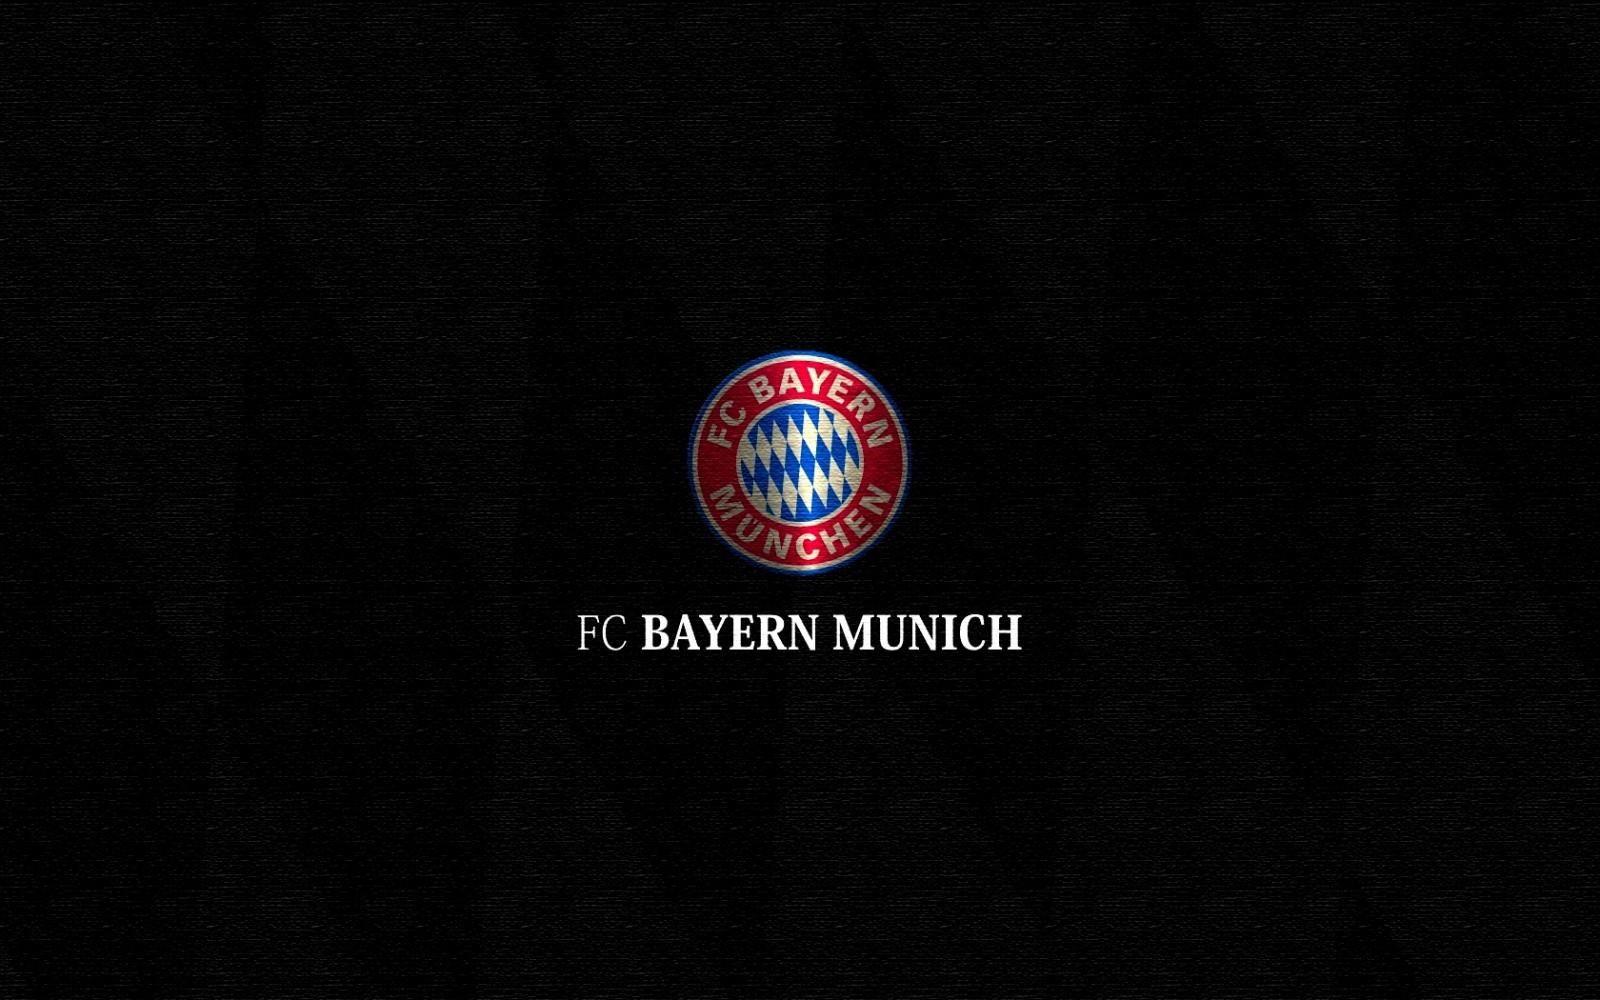 Cool Fond D Ecran Hd Iphone Swag 154 Check More At Http All Images Net Fond Decran Hd Iphone Swag 154 Bayern Bayern Munich Bayern Wallpaper